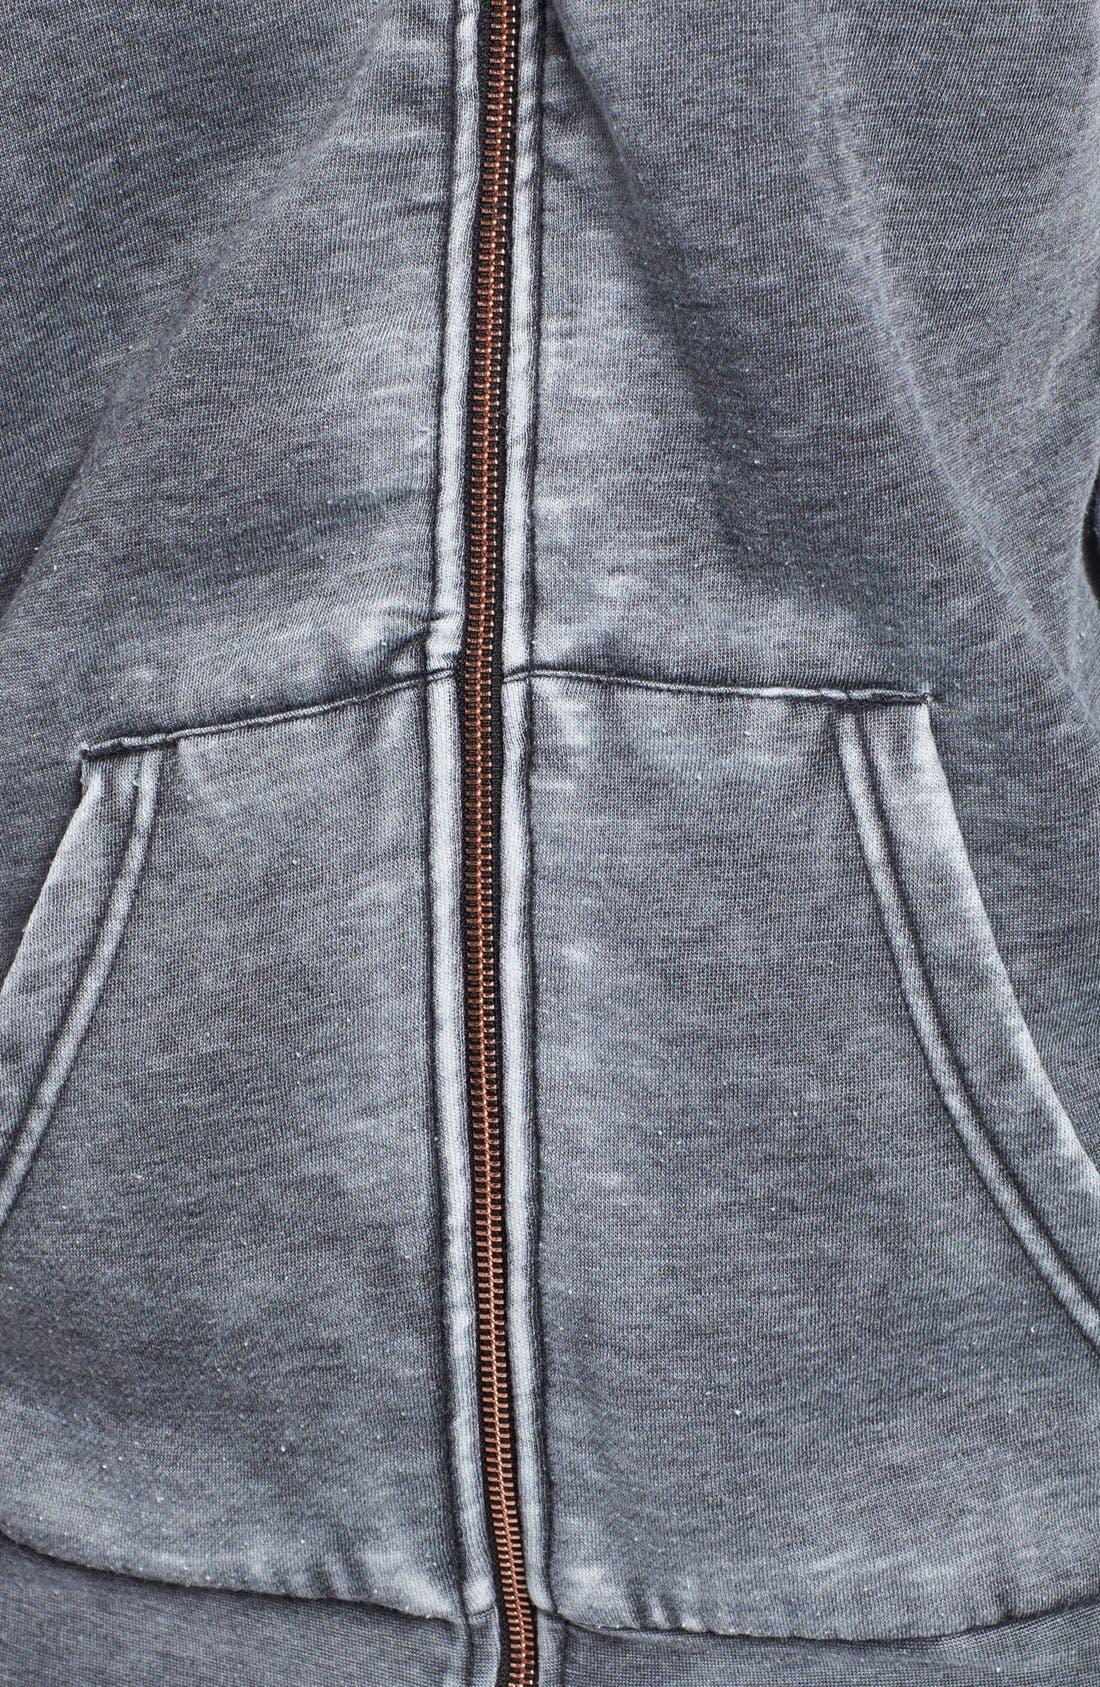 Full Zip Hooded Sweatshirt,                             Alternate thumbnail 2, color,                             020